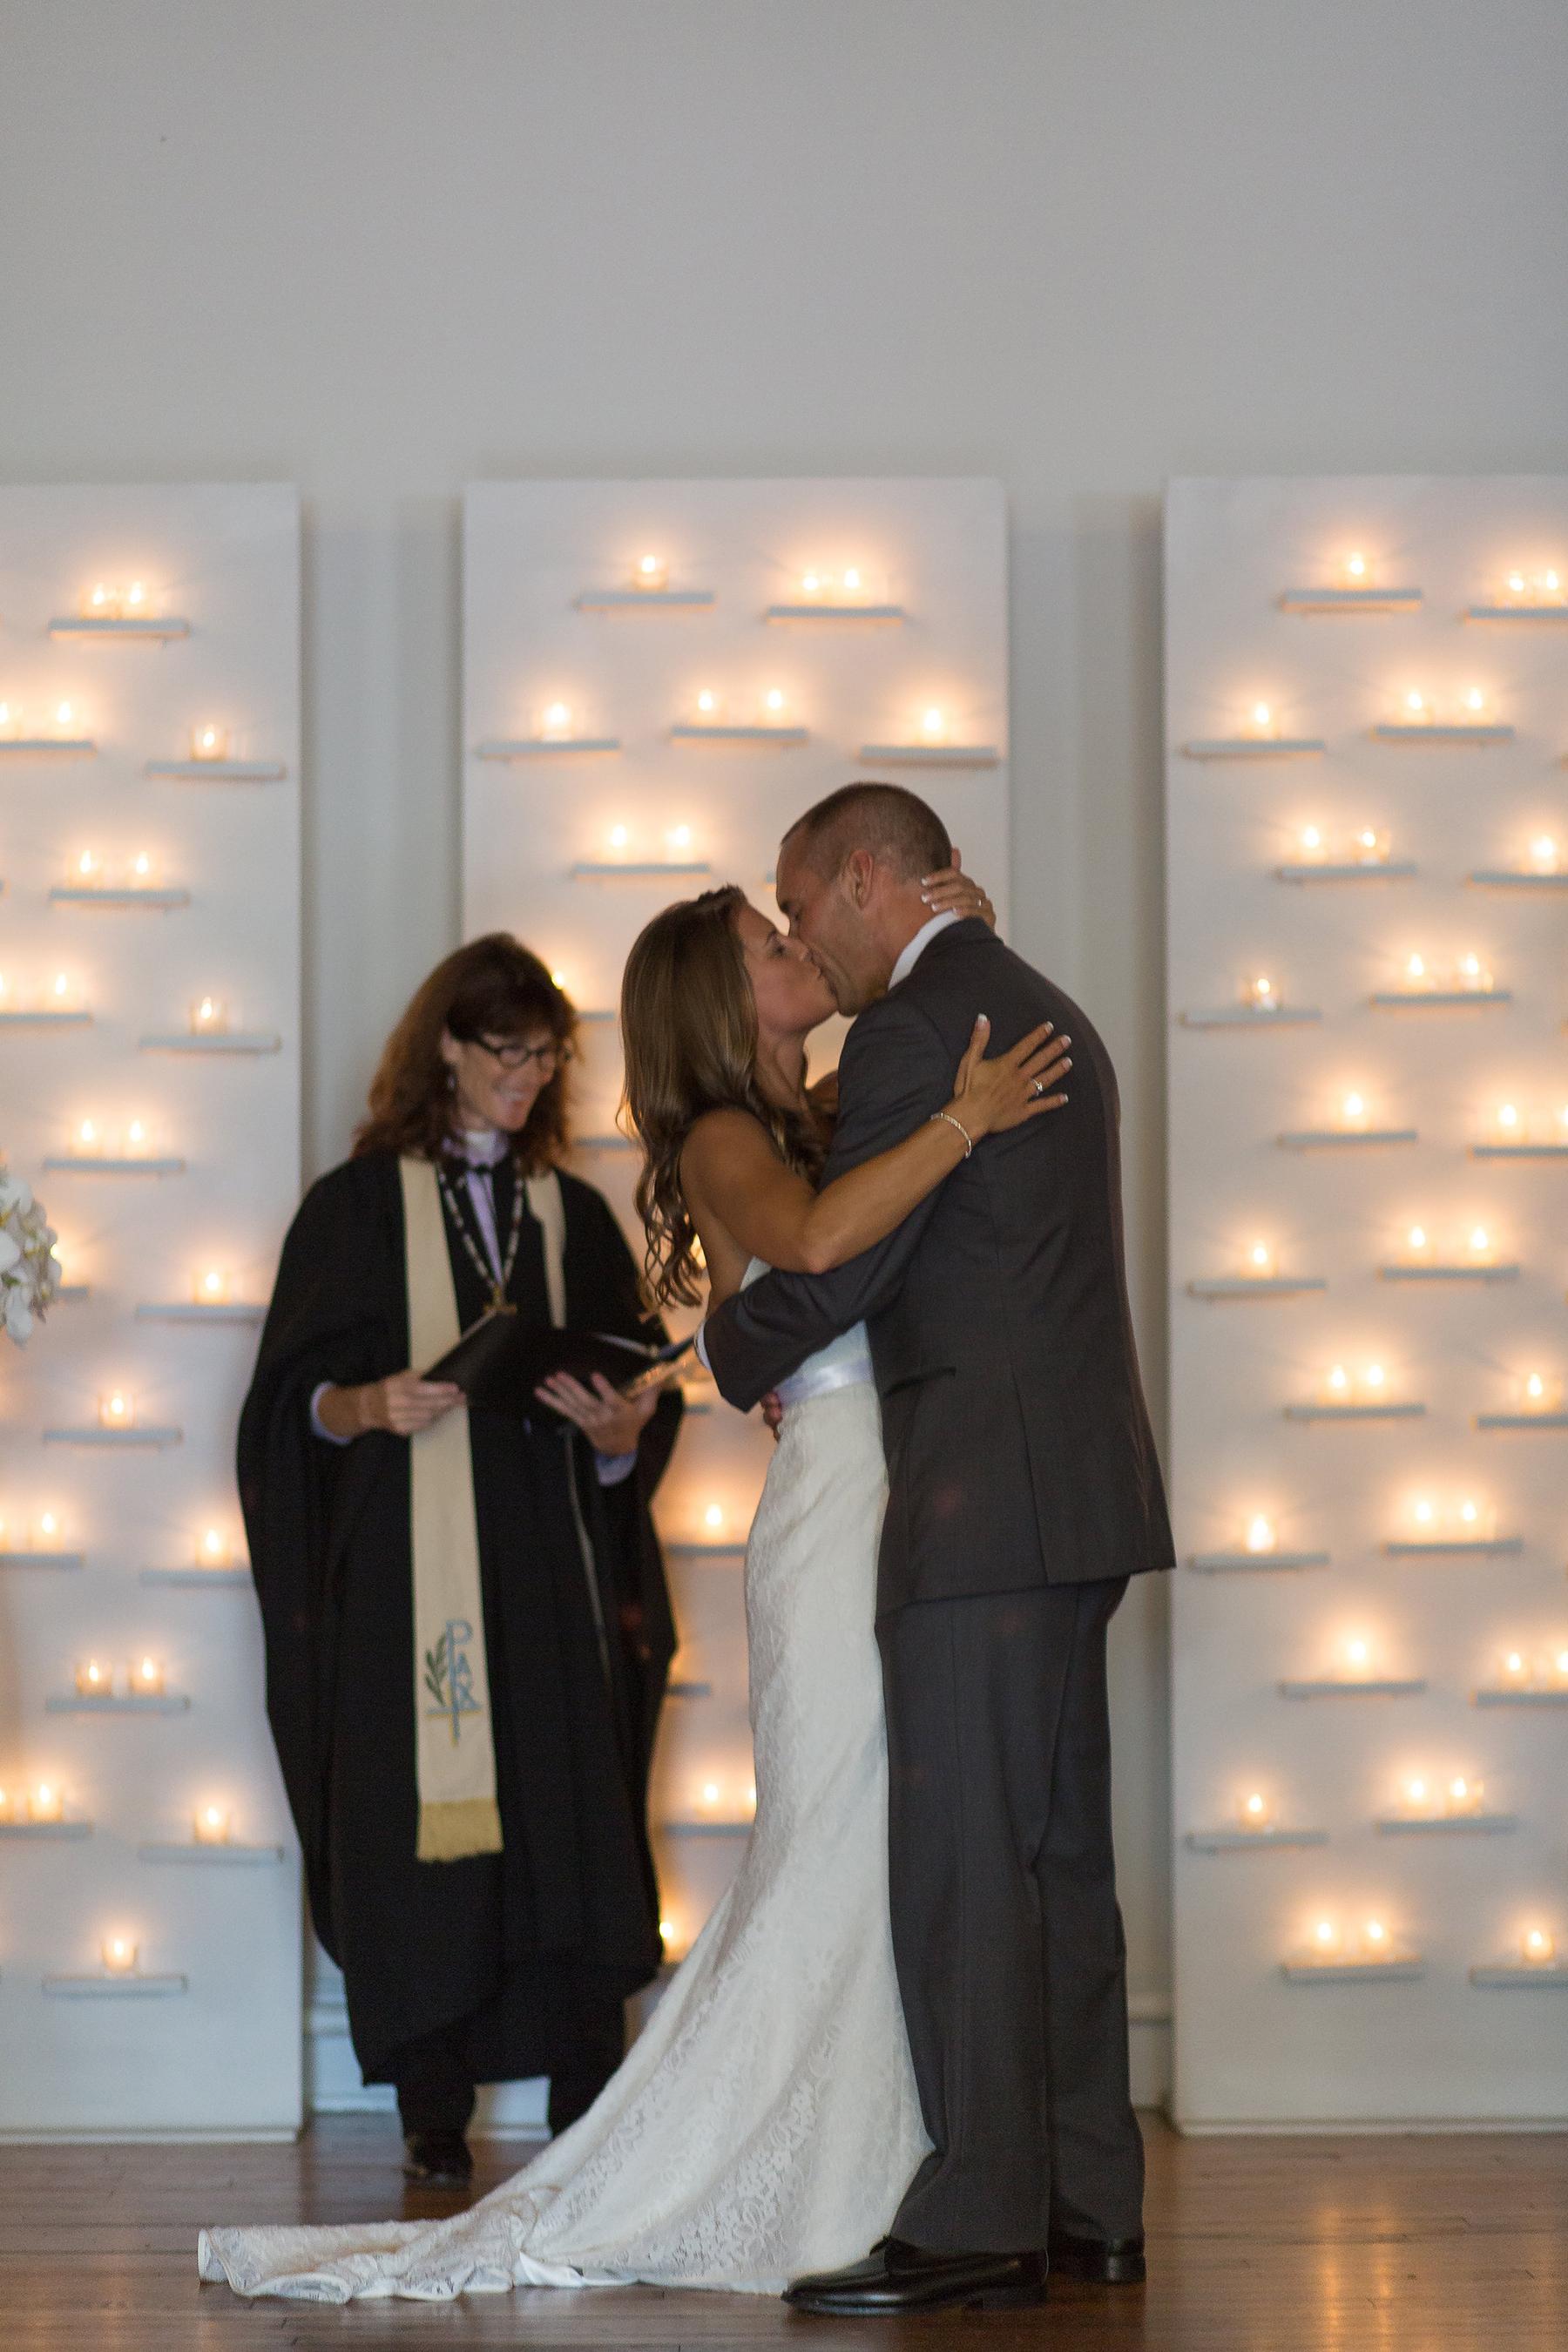 Ceremony-46.jpg